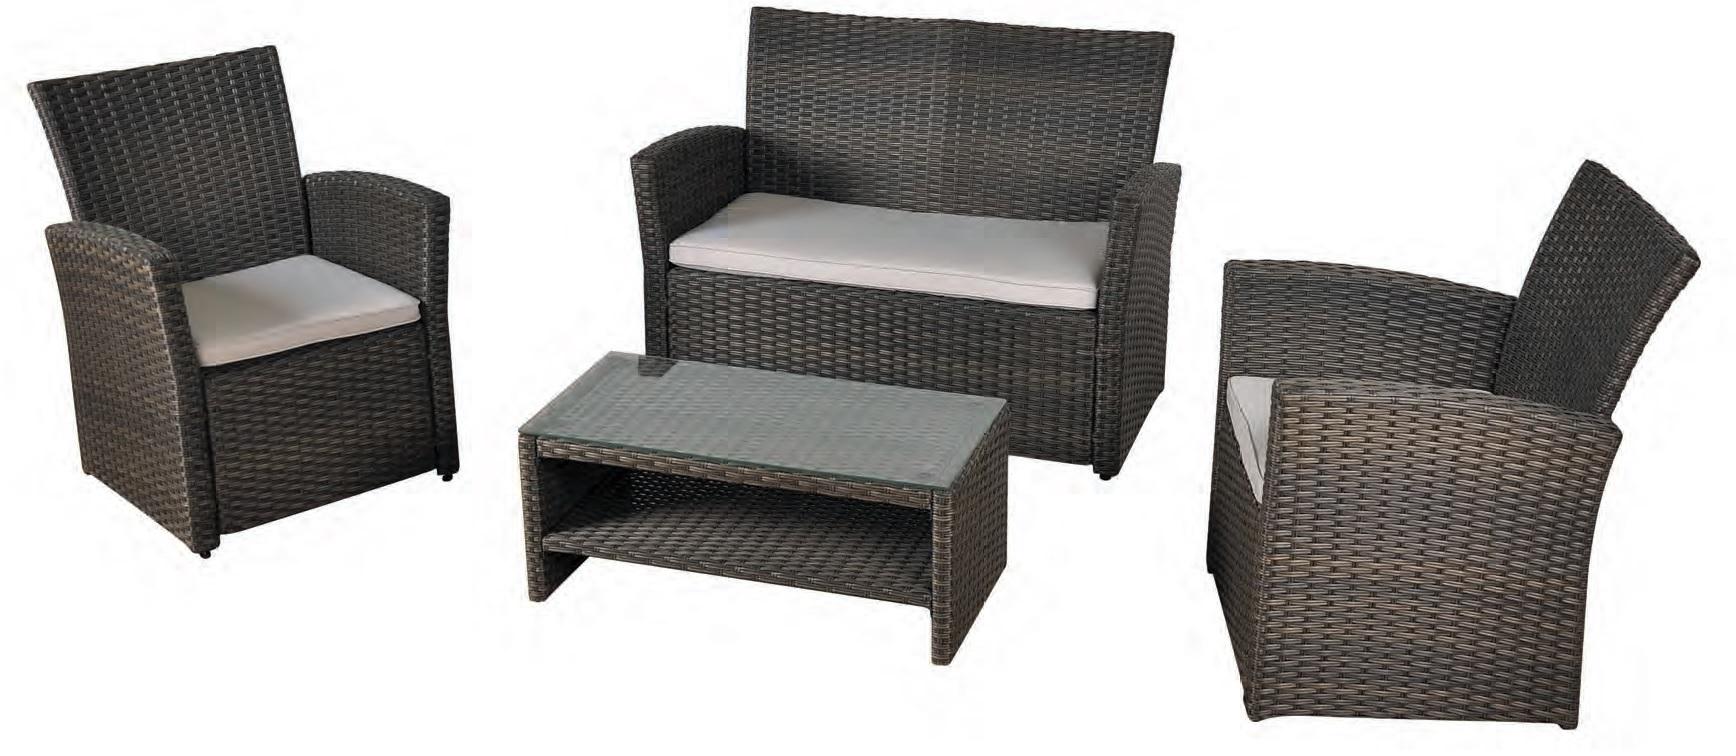 Set sofa terraza economico rattan oliver for Muebles imitacion